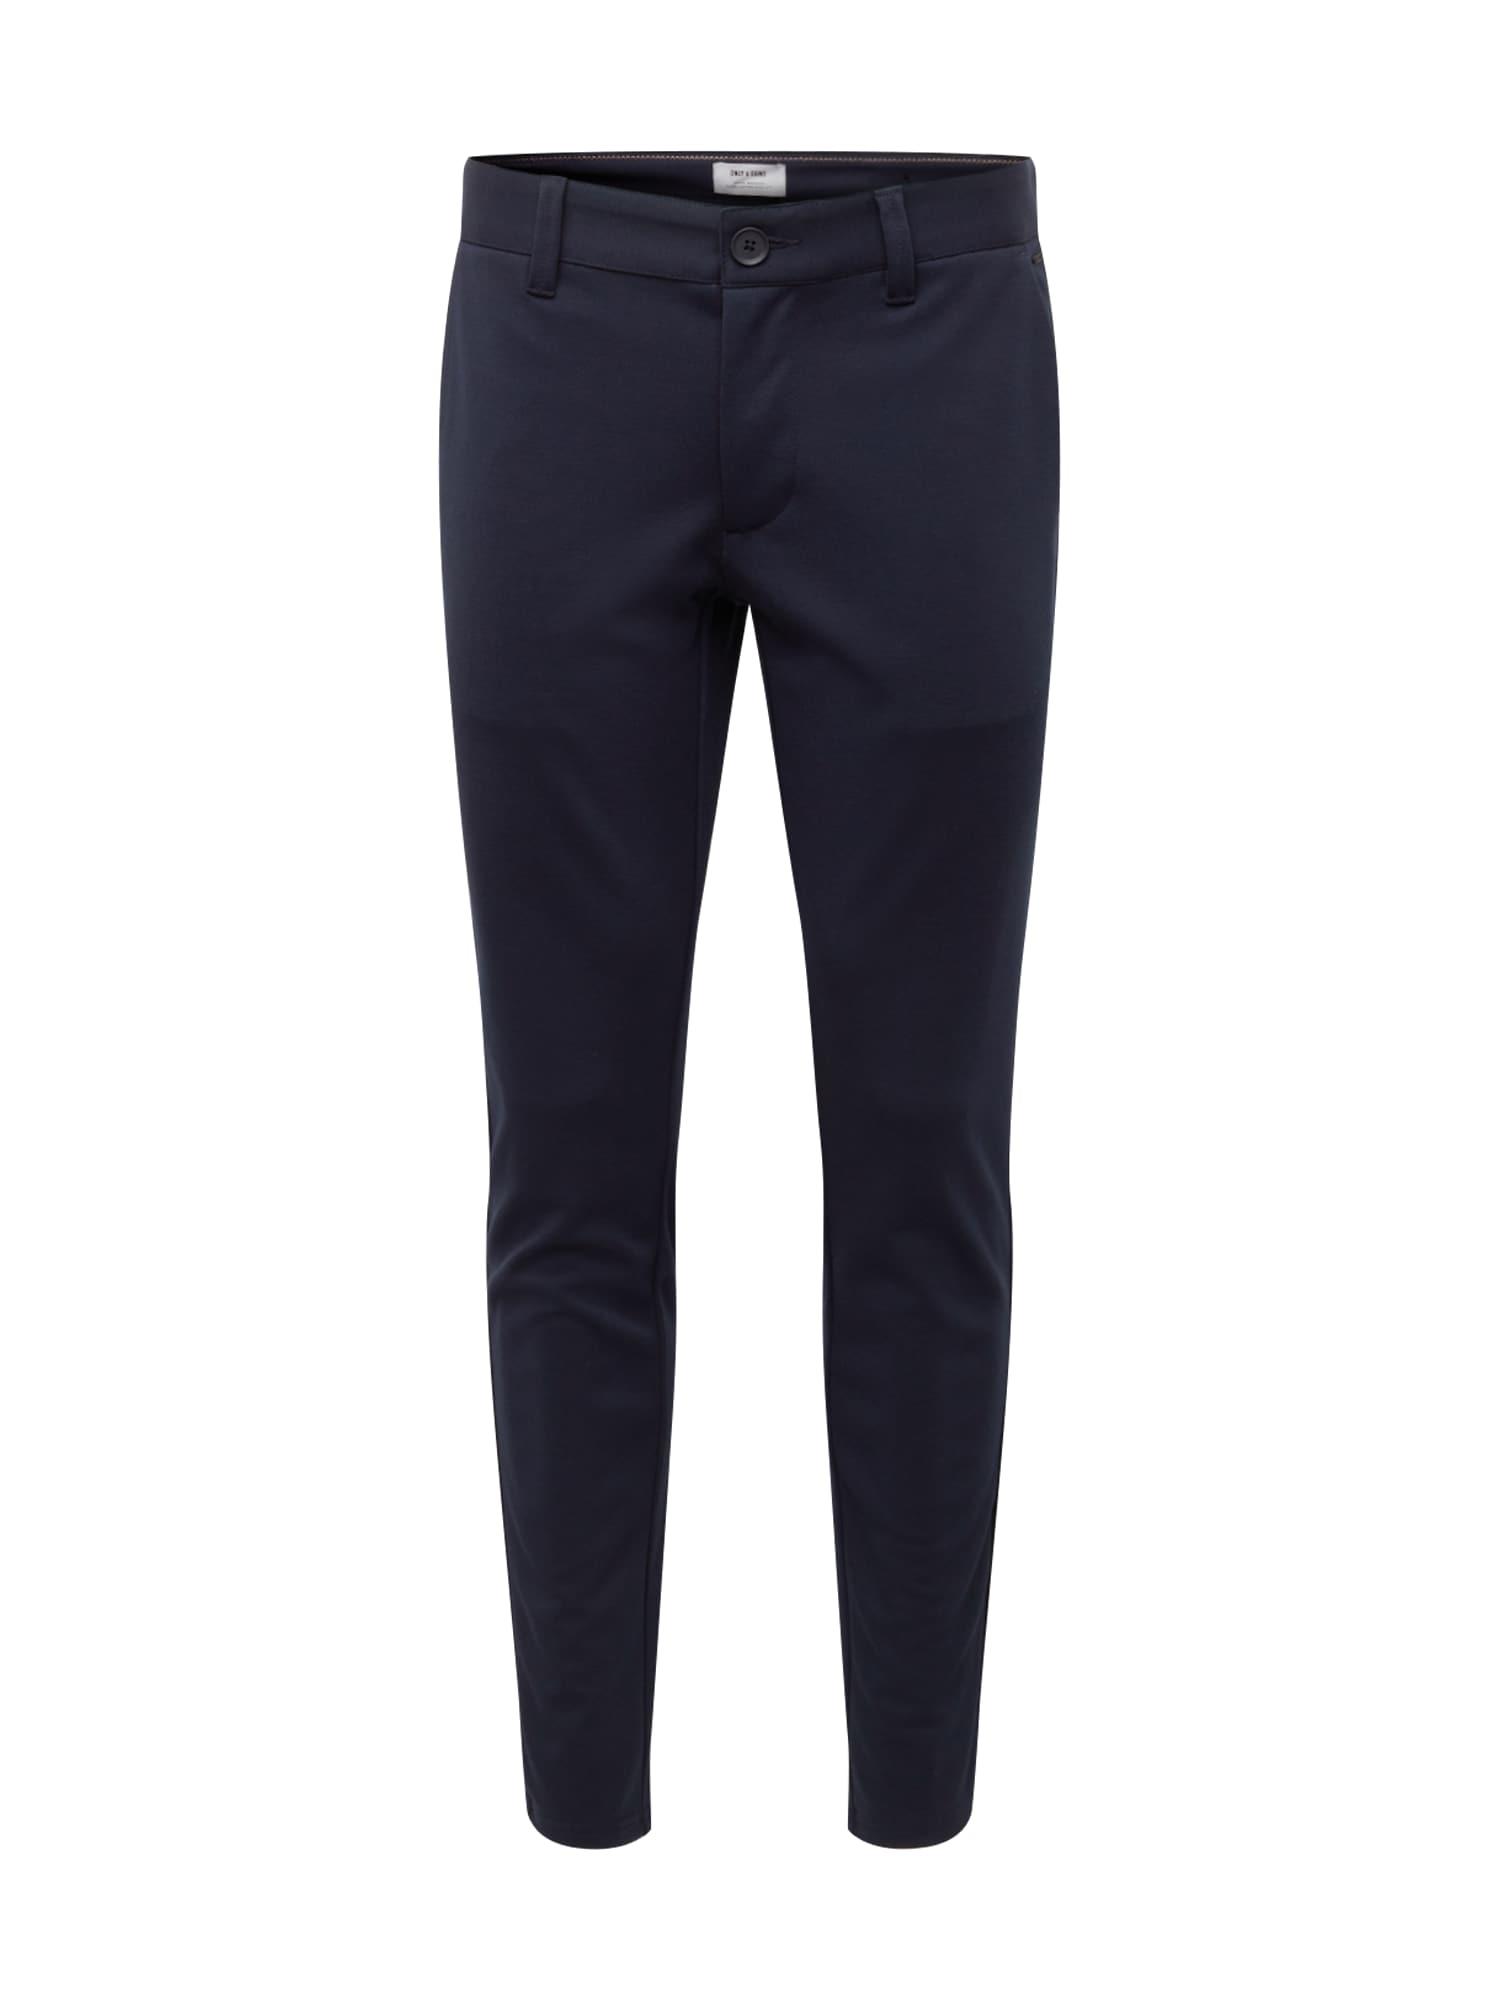 Chino kalhoty MARK PANT GW 0209 tmavě modrá Only & Sons